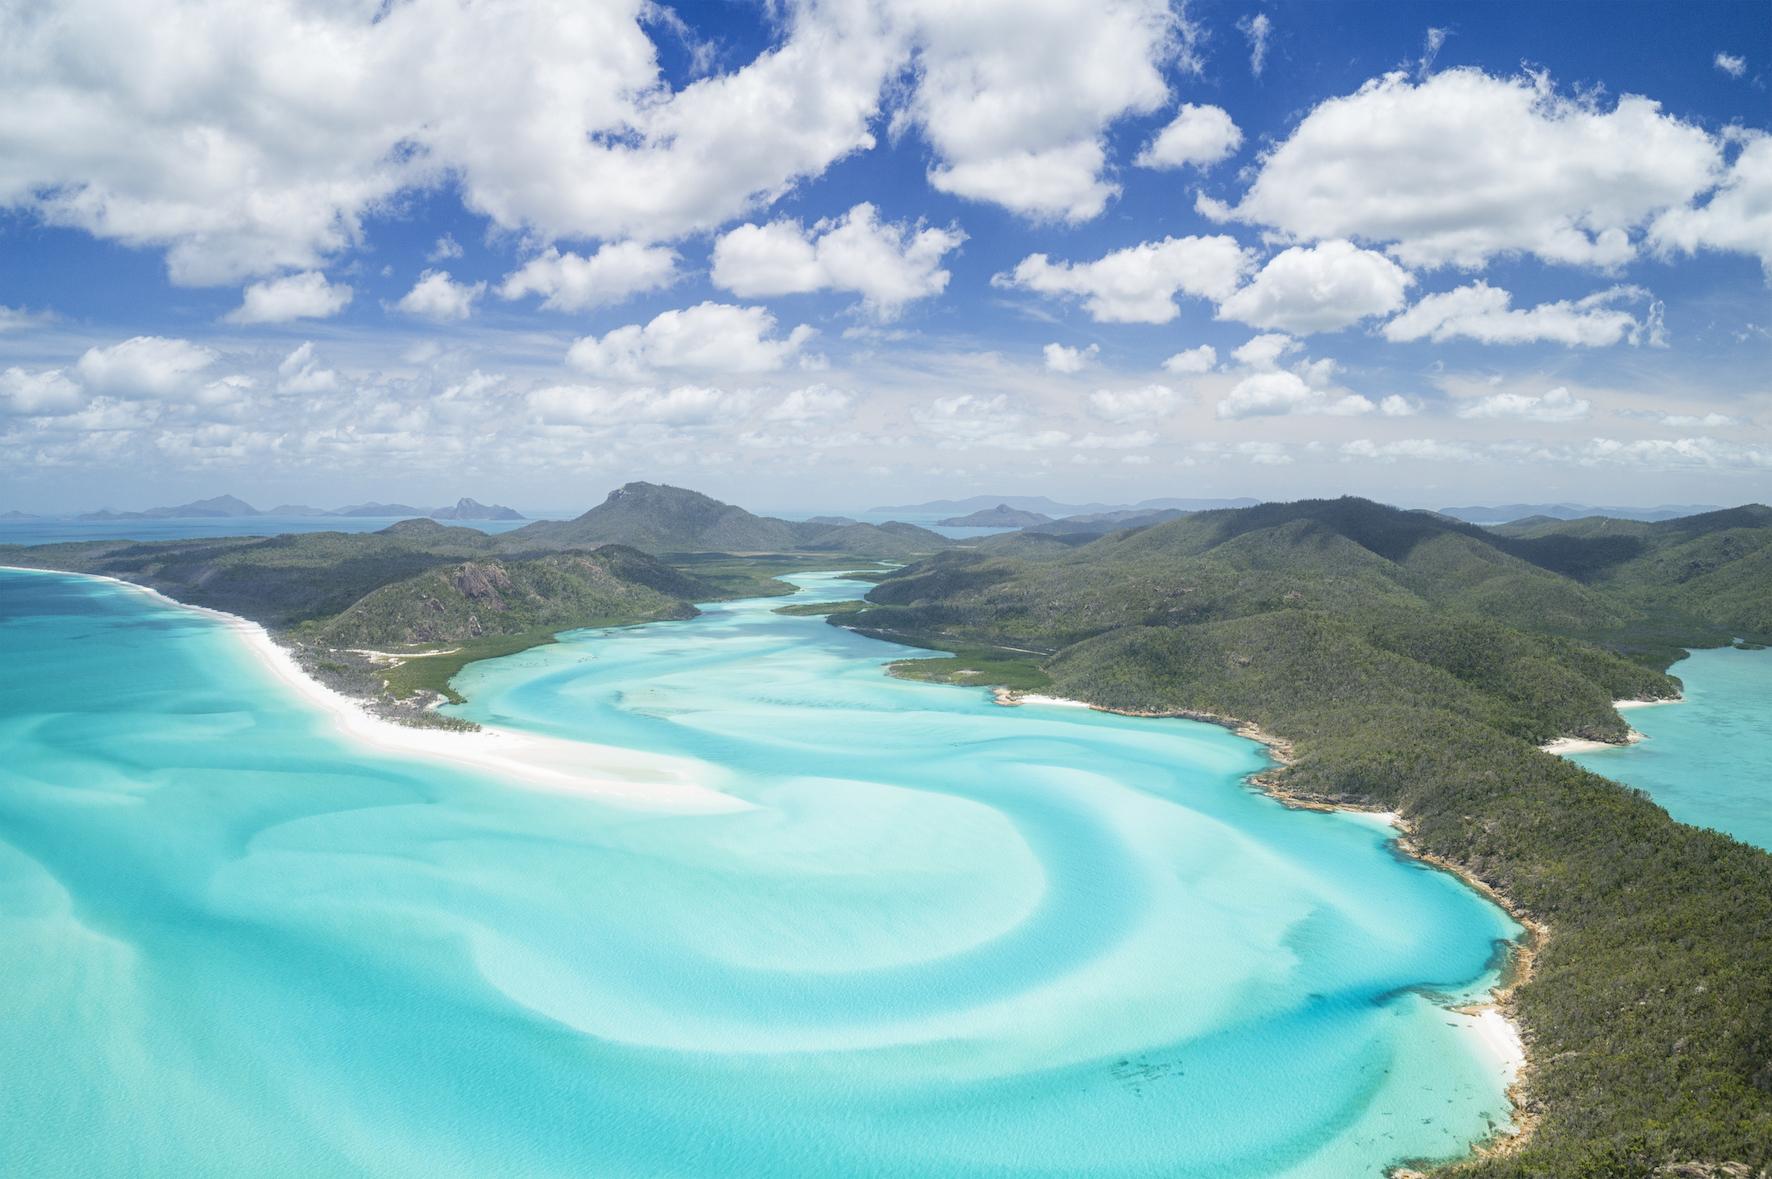 Great Barrier Reef aerial photo wallpaper